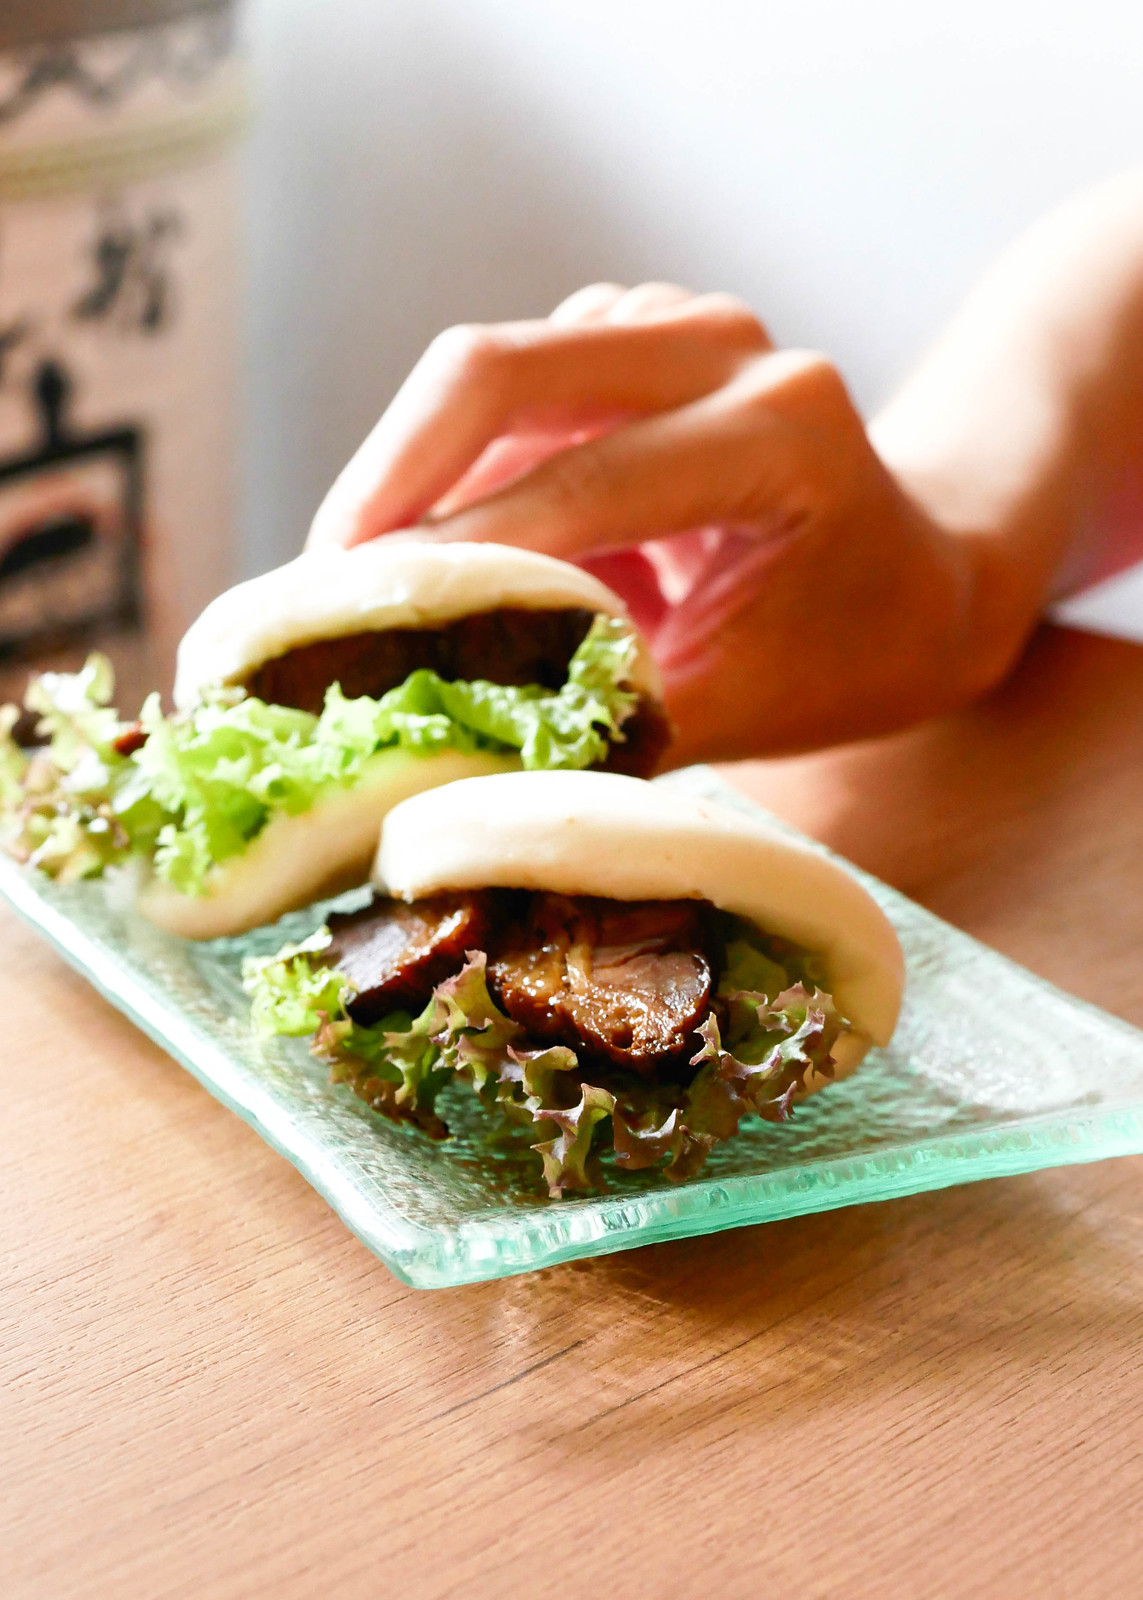 Manzoku Japanese Restaurant: Hirata Classic Pork Buns